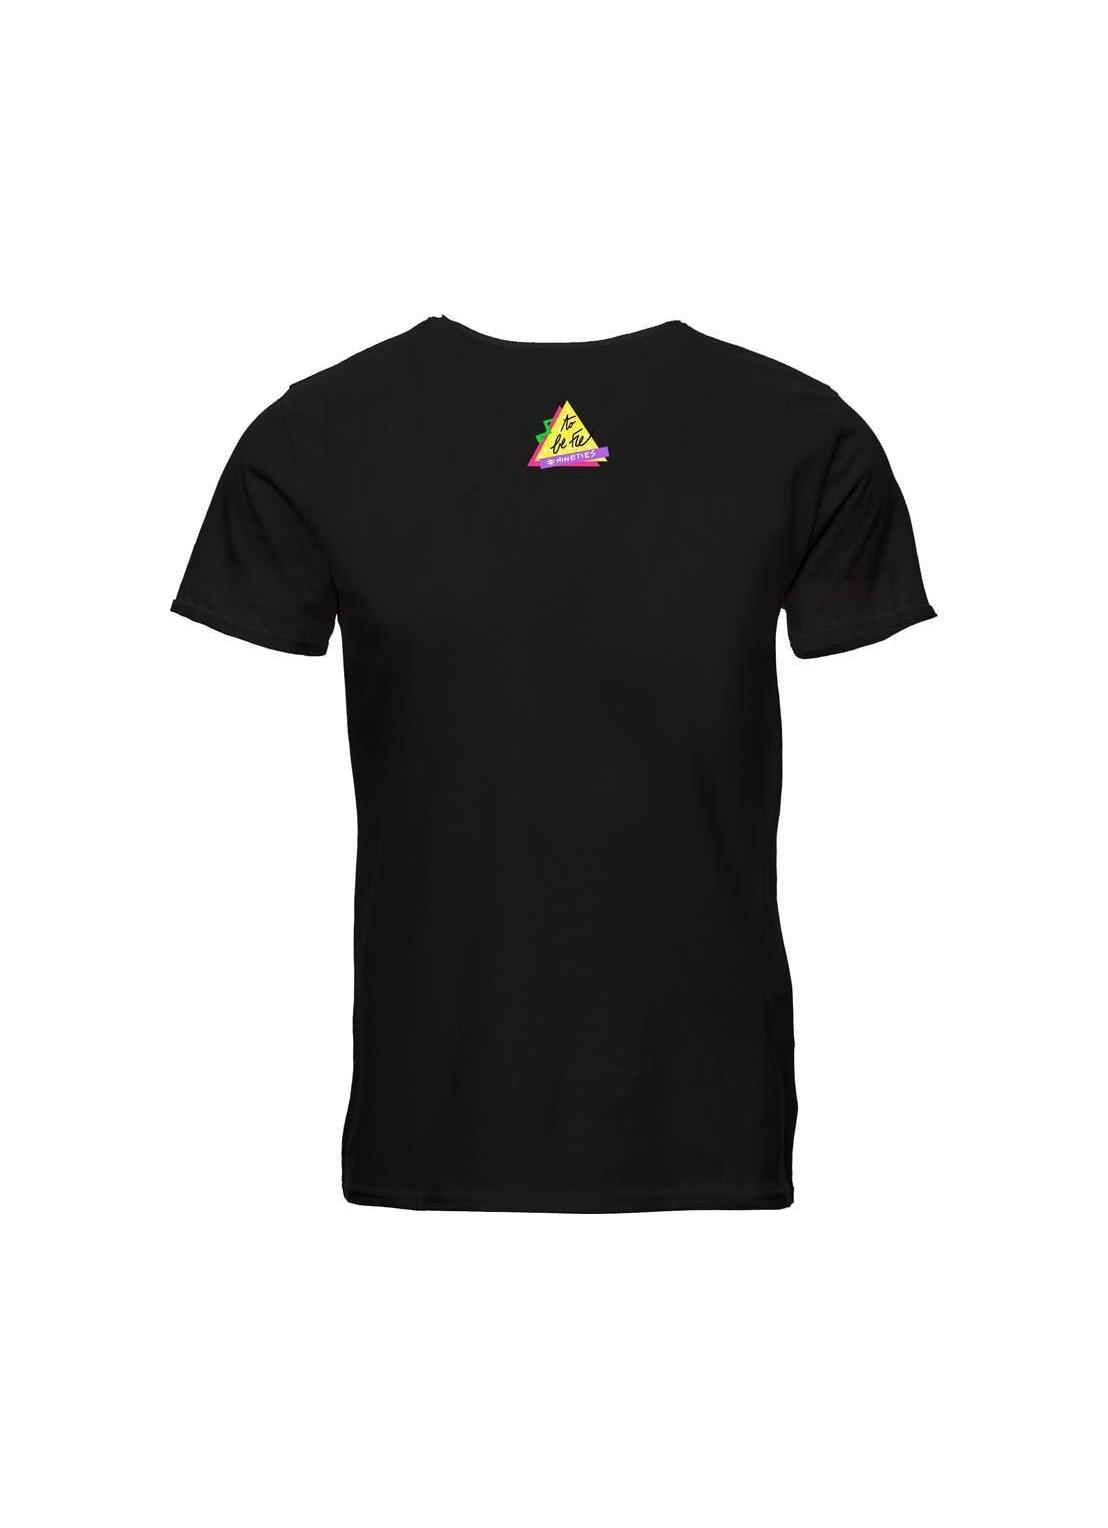 "T-shirt ""Sudore.Fiato.Cuore"" unisex bianca"